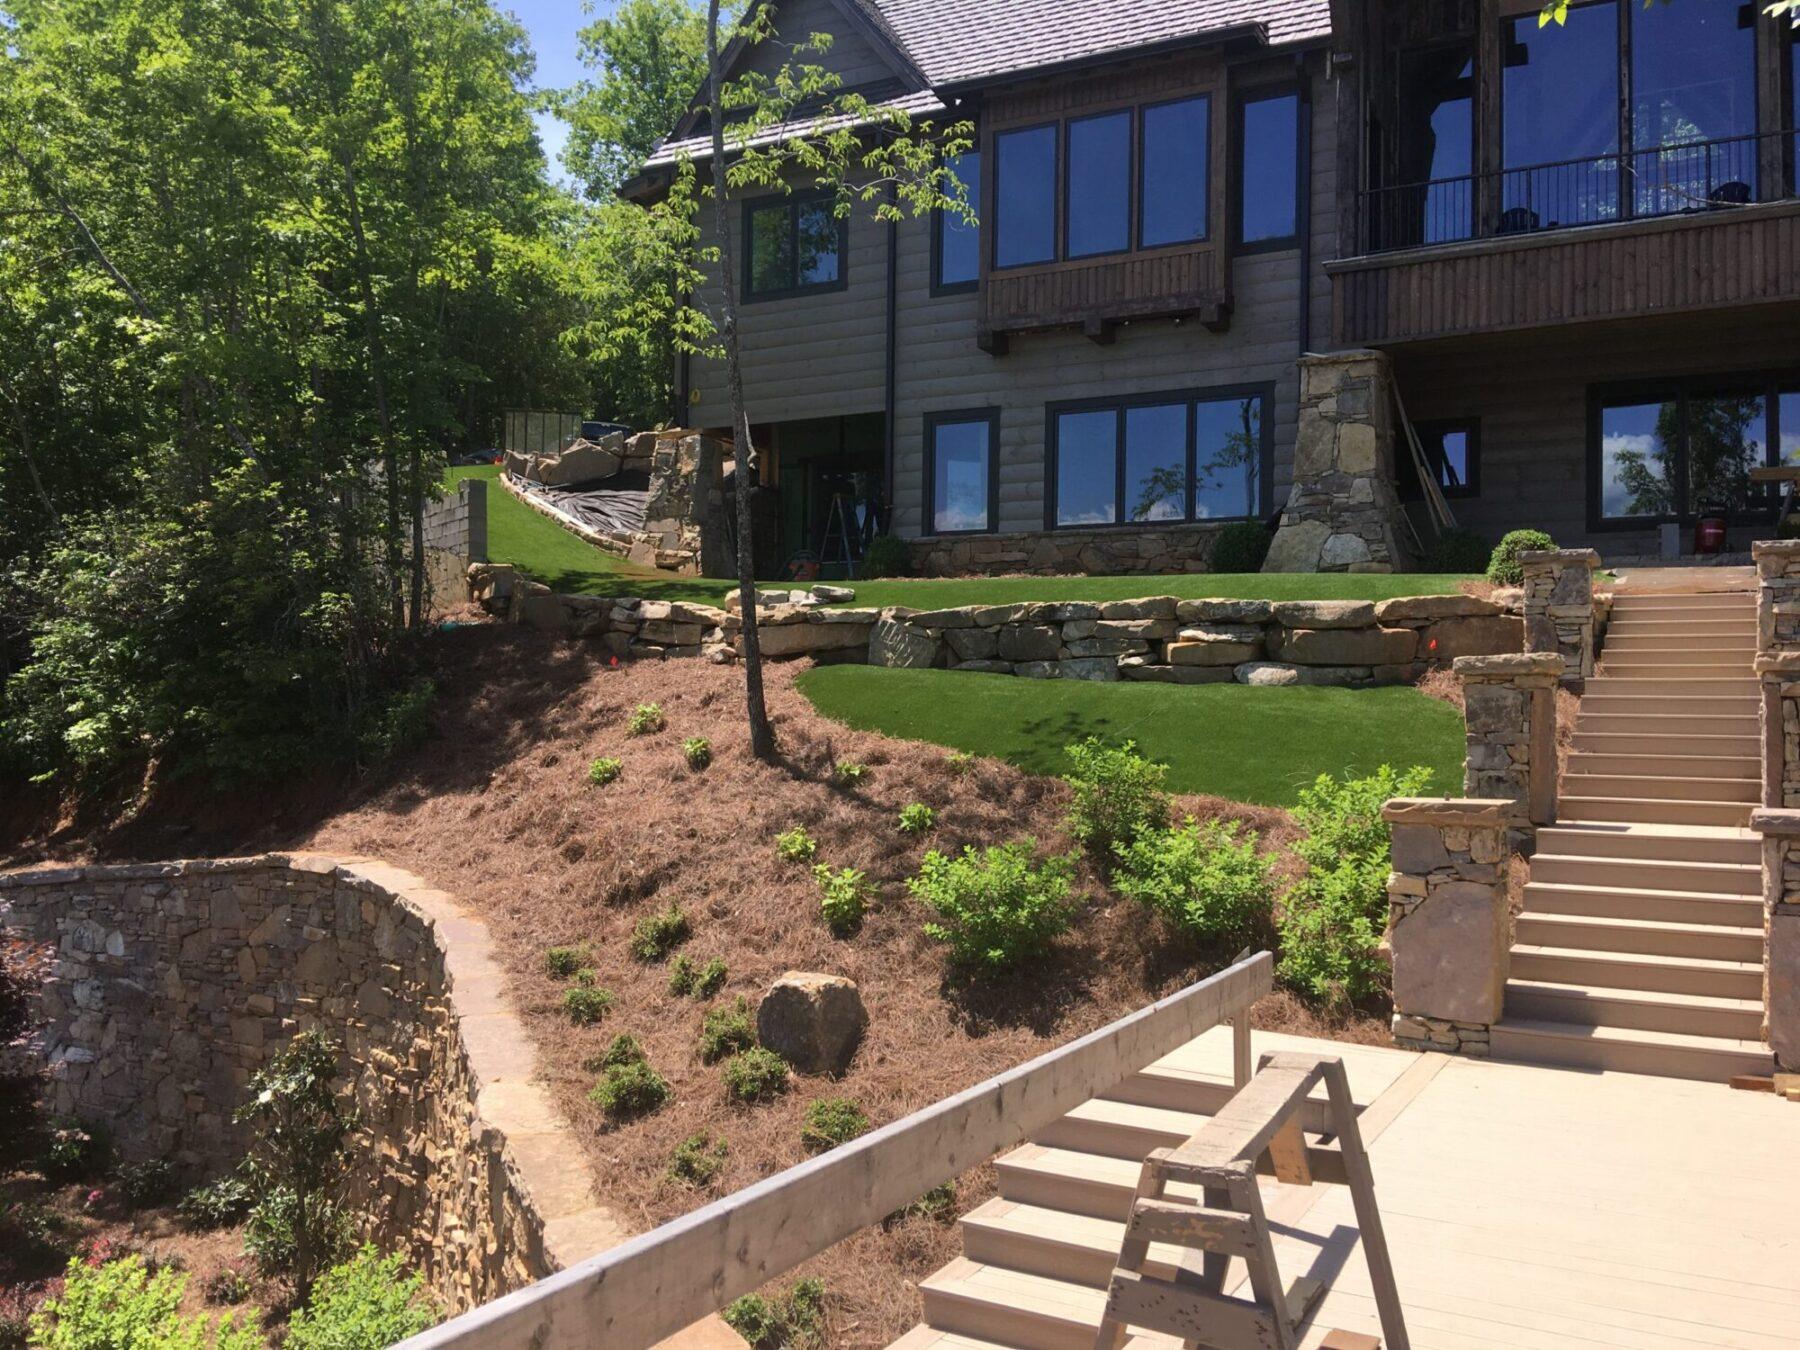 Artificial grass, backyard of residential home